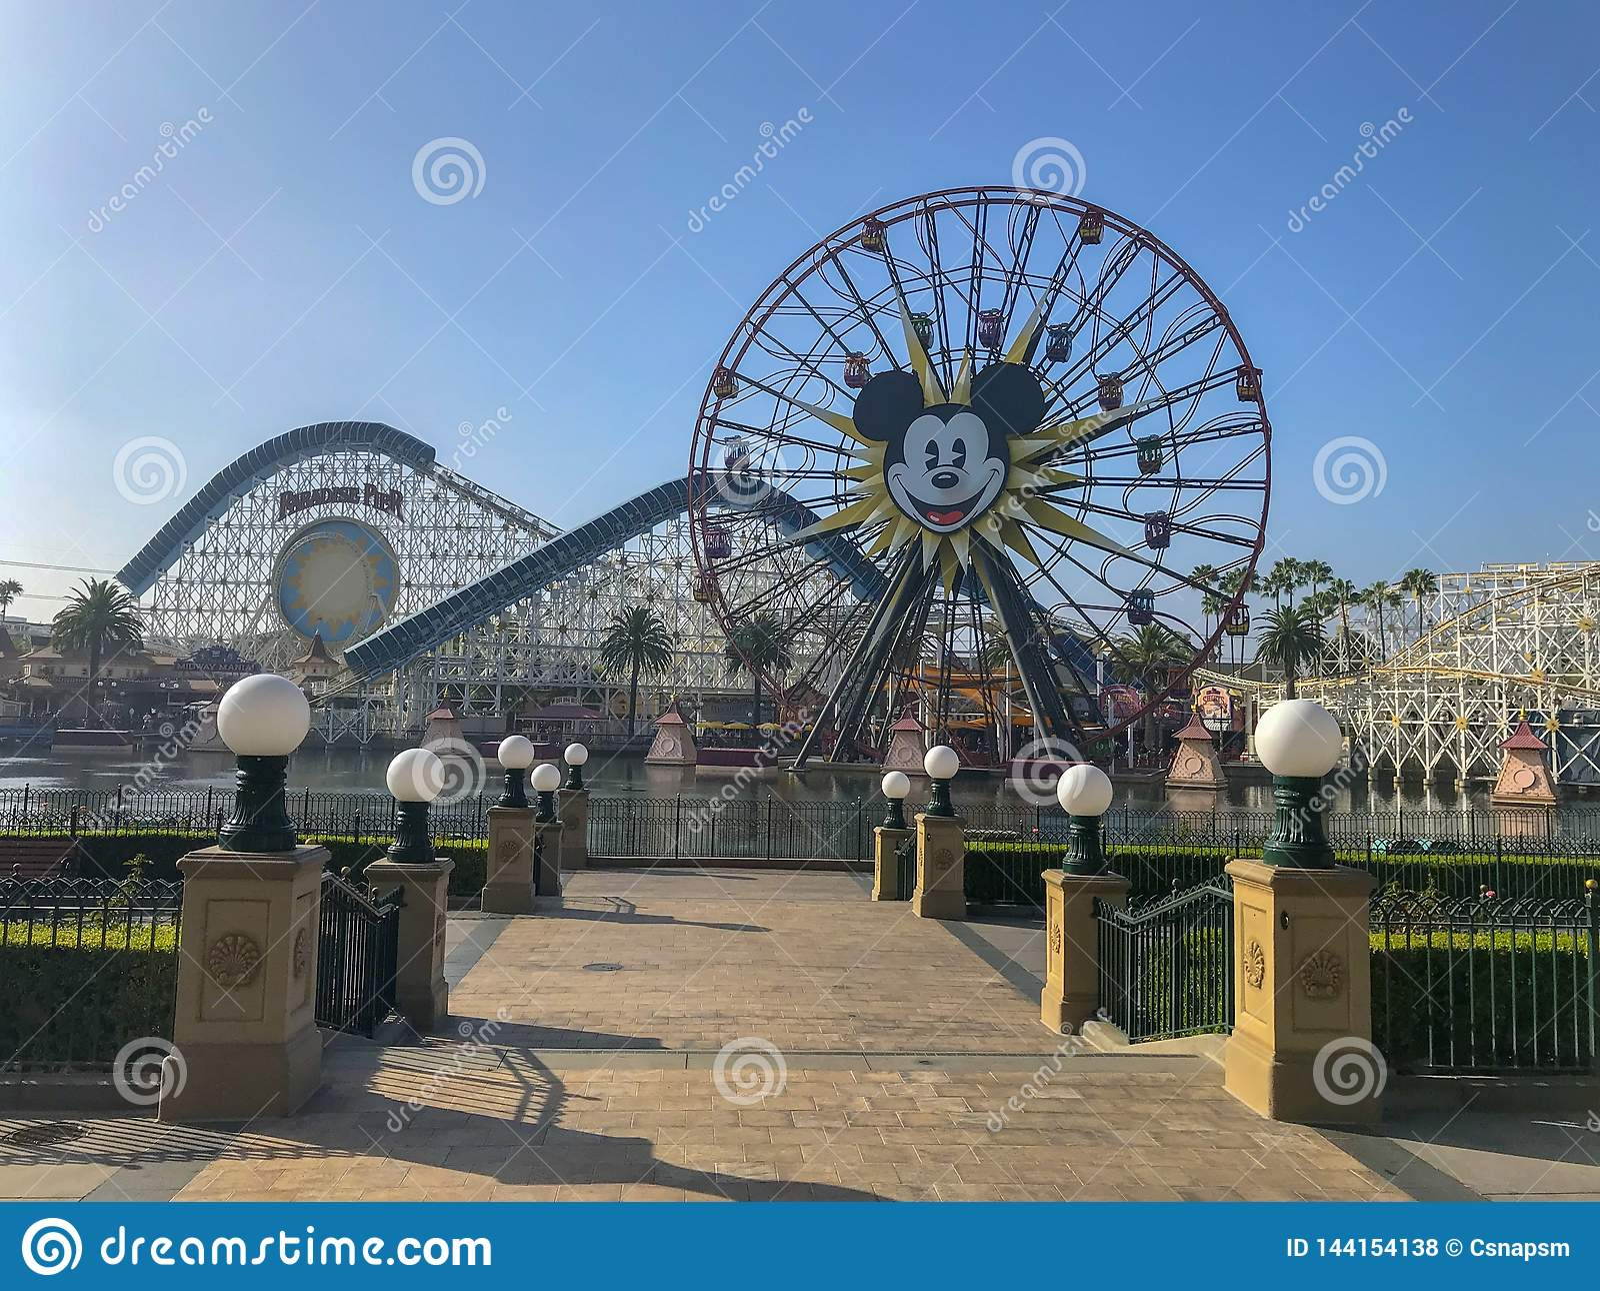 Disneyland's Kalifornien affärsföretag Mickey Mouse Farris Wheel